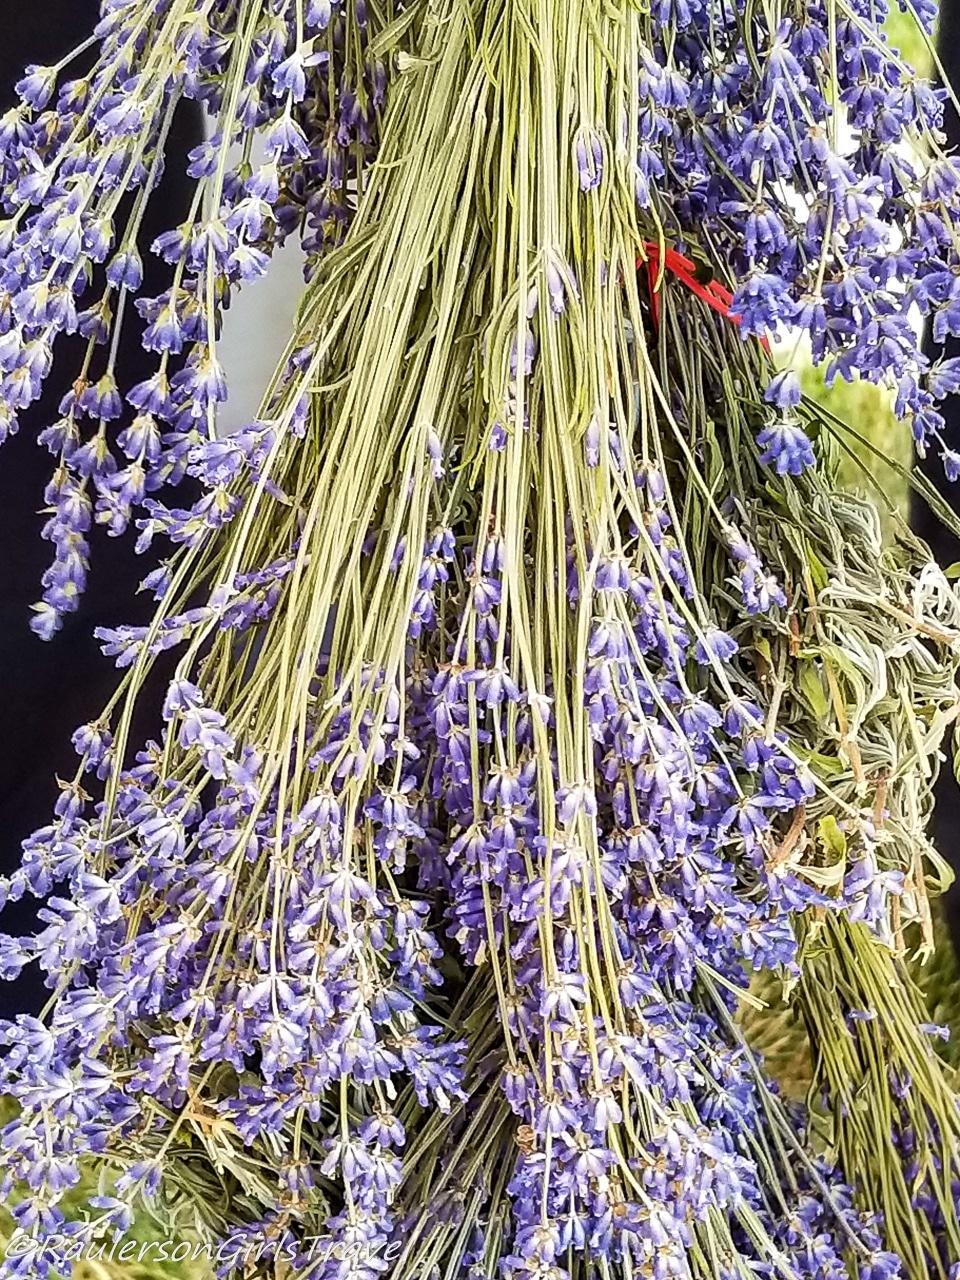 Drying Lavender bundles